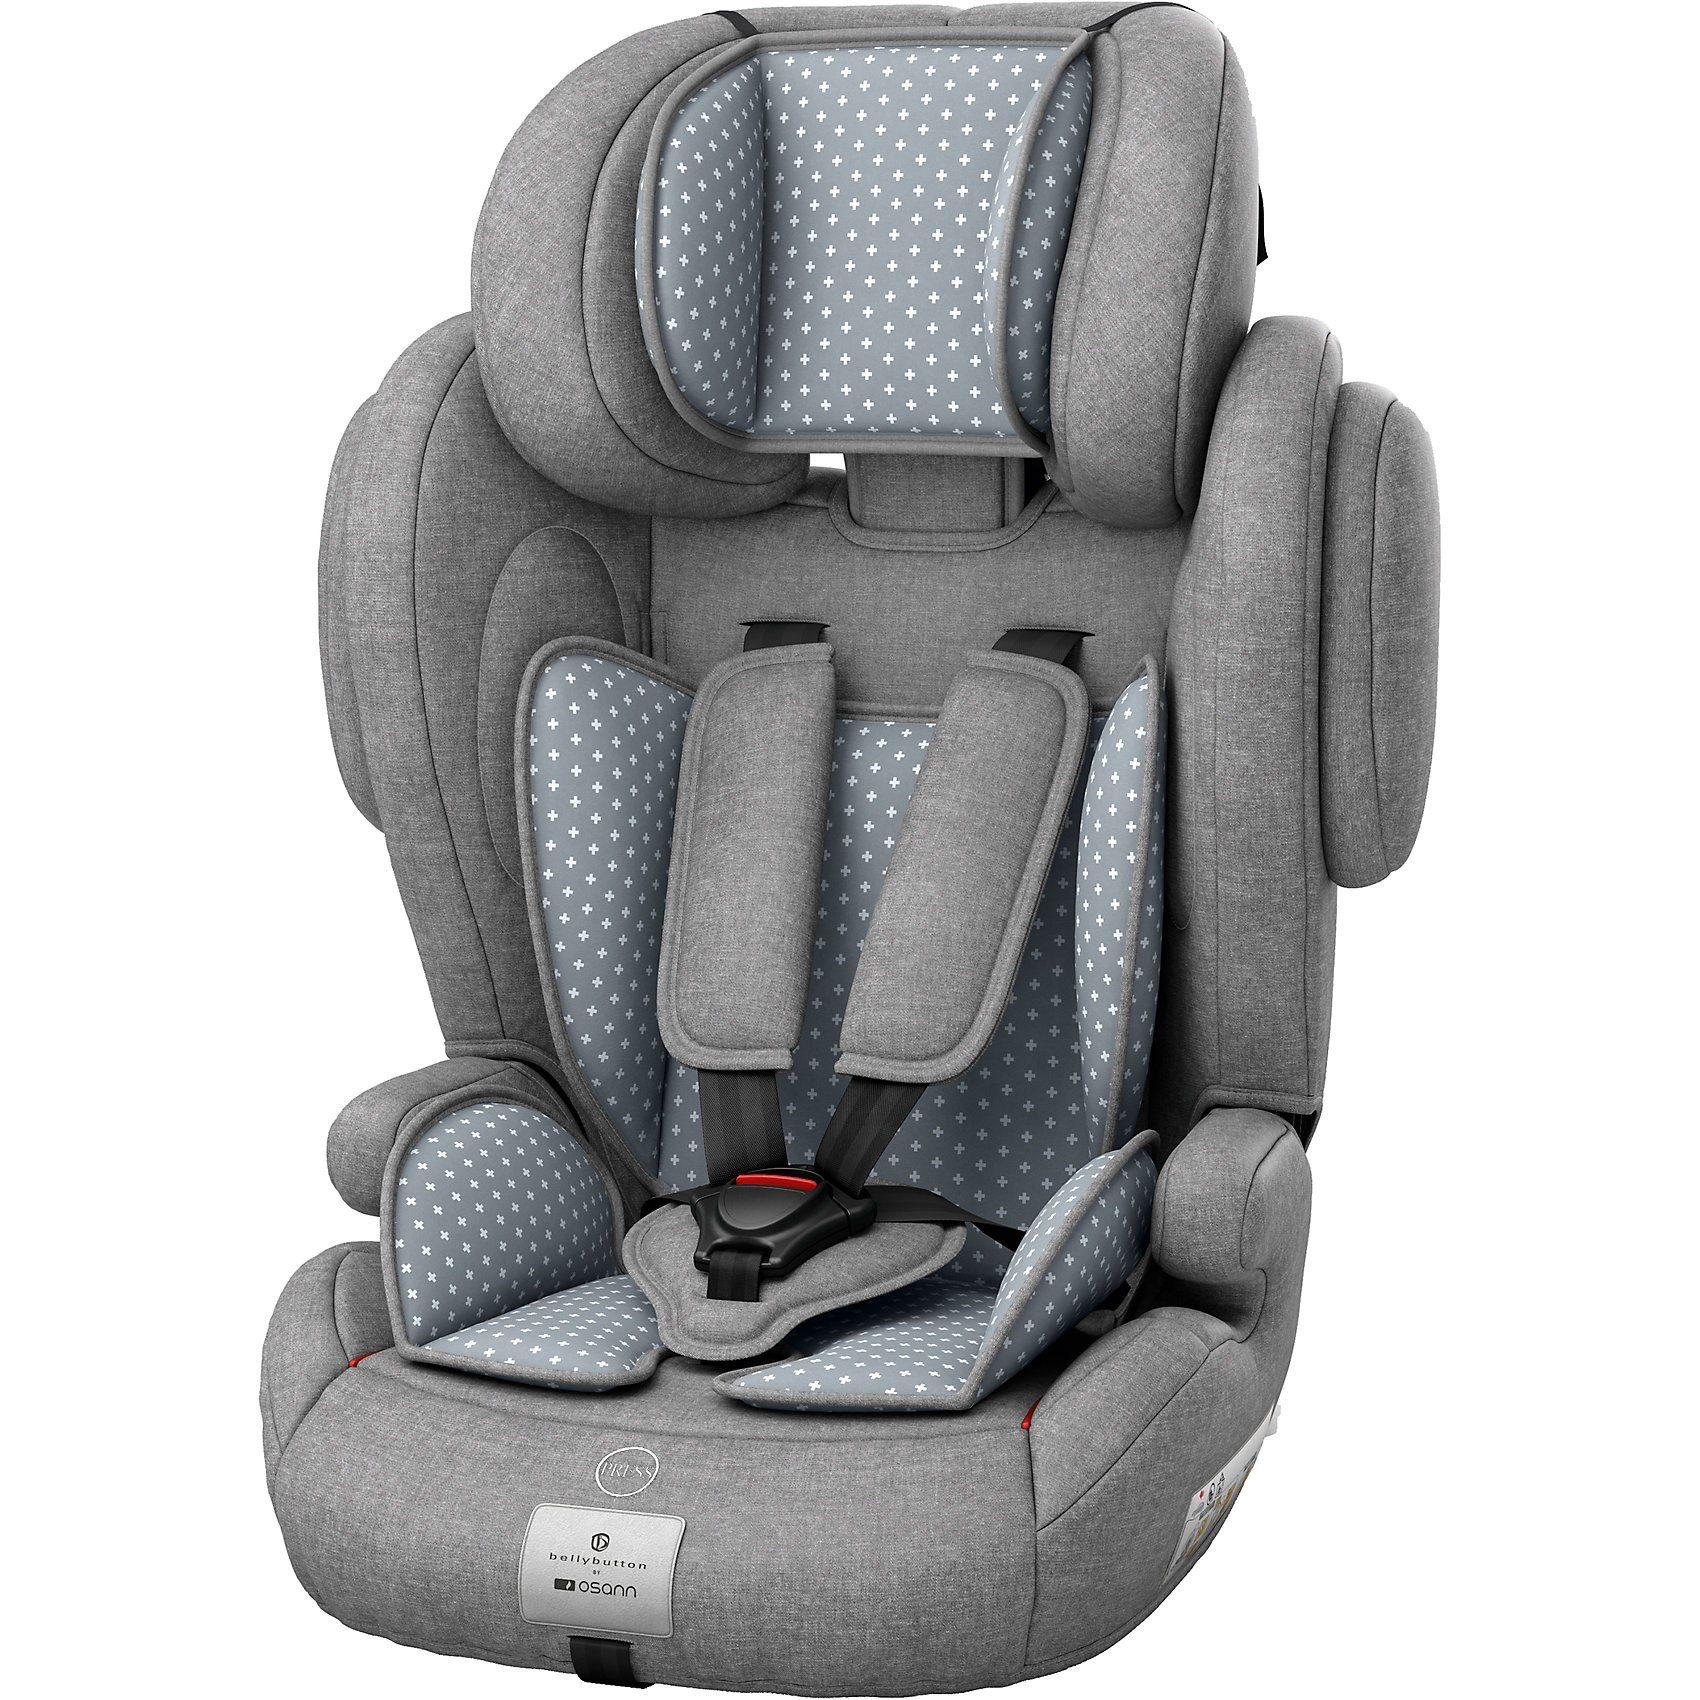 Osann Auto-Kindersitz Flux Plus, bellybutton, Steel Grey, 2018